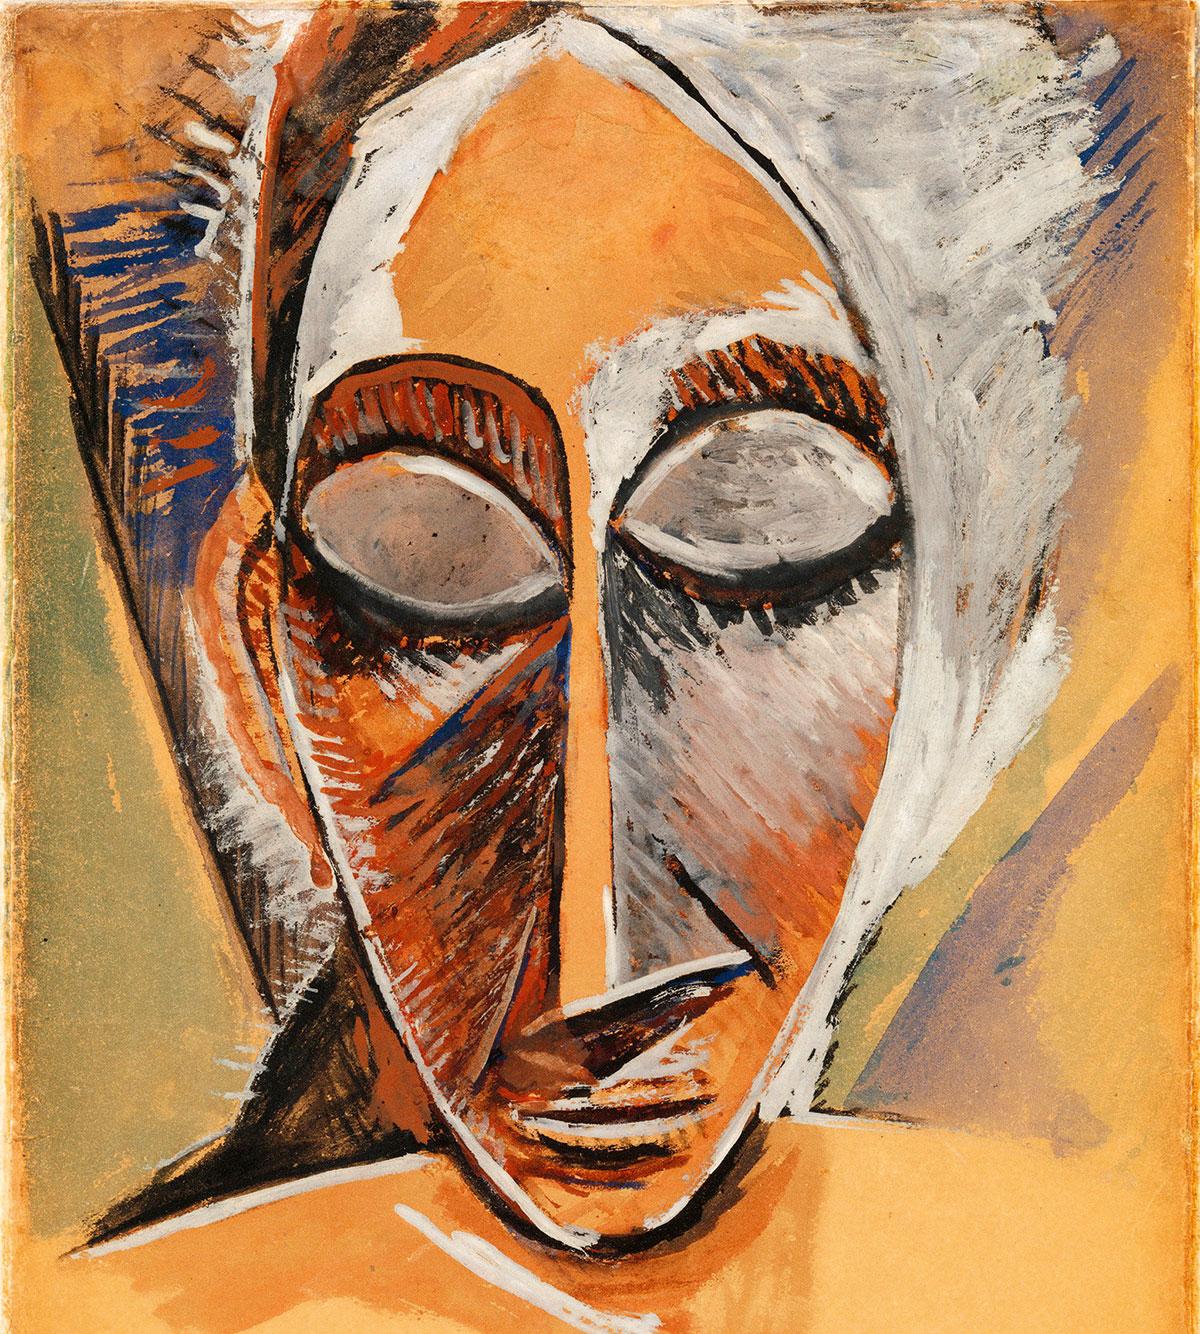 Her çağda maske | Atlas | Keşfet